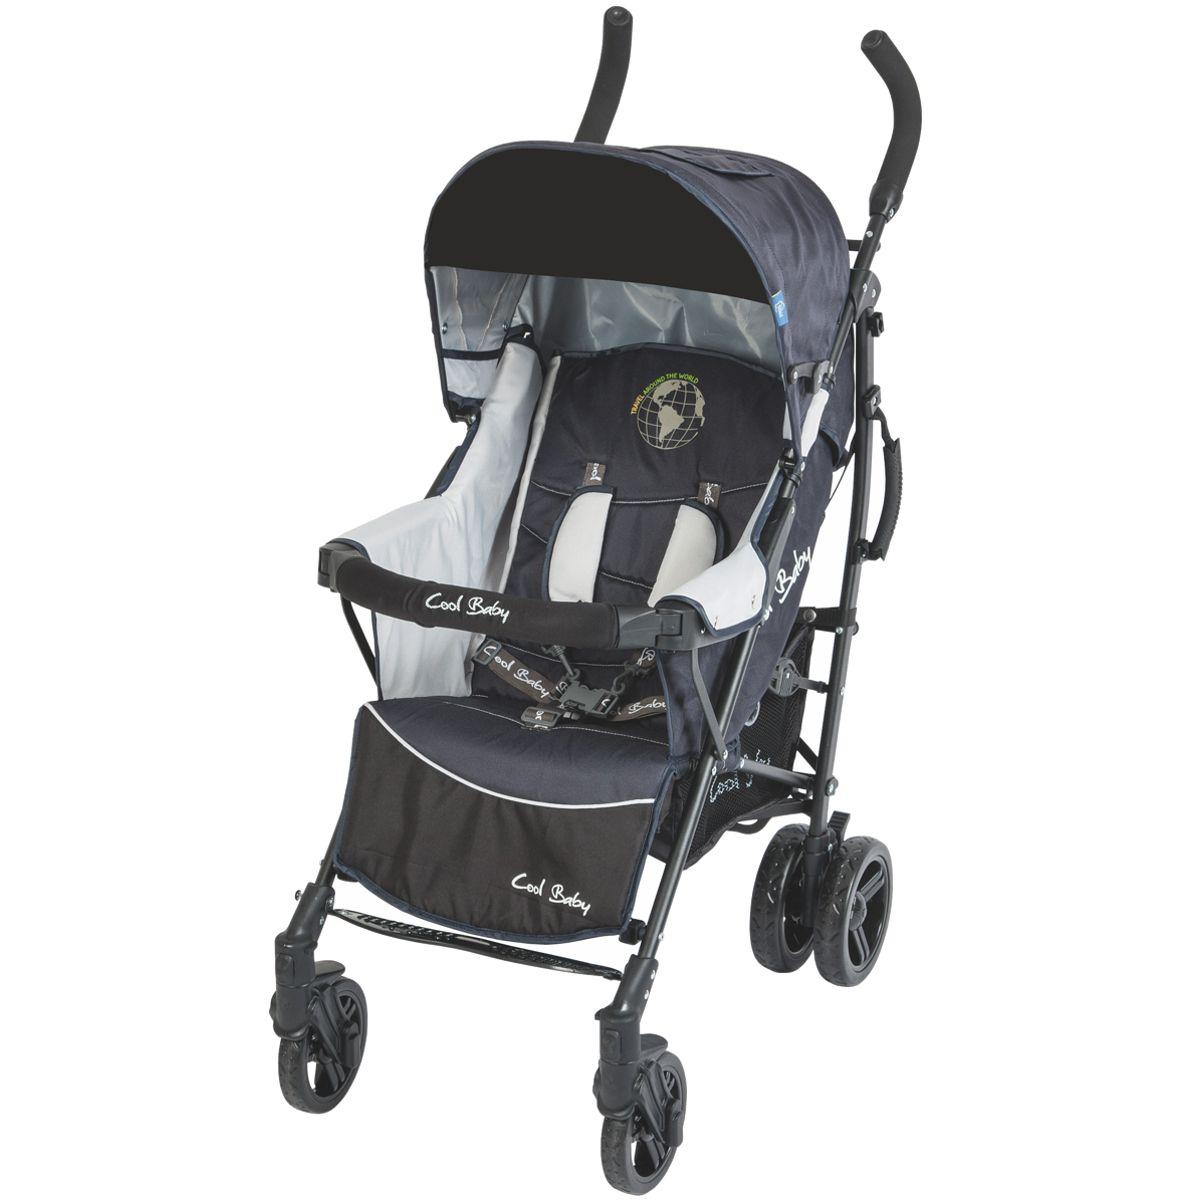 buggy kinderwagen liegebuggy sportwagen jogger babywagen kindersportwagen paul ebay. Black Bedroom Furniture Sets. Home Design Ideas